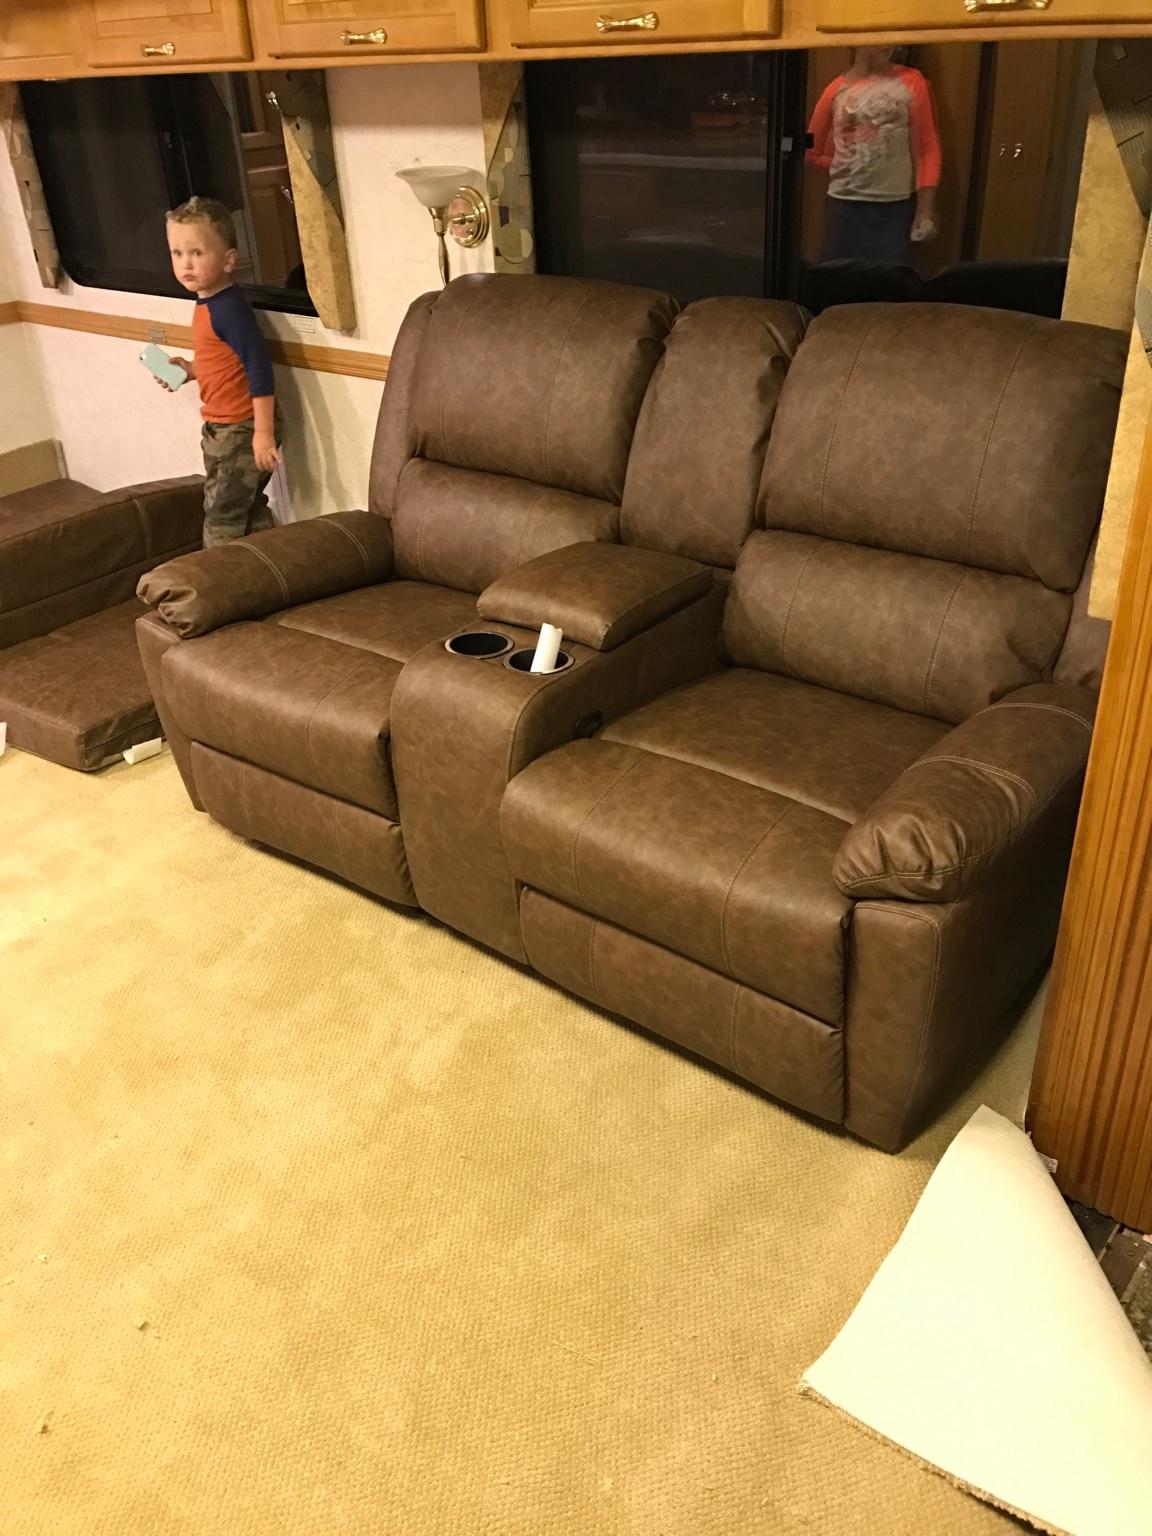 02 DutchStar 4090 need furniture - iRV2 Forums